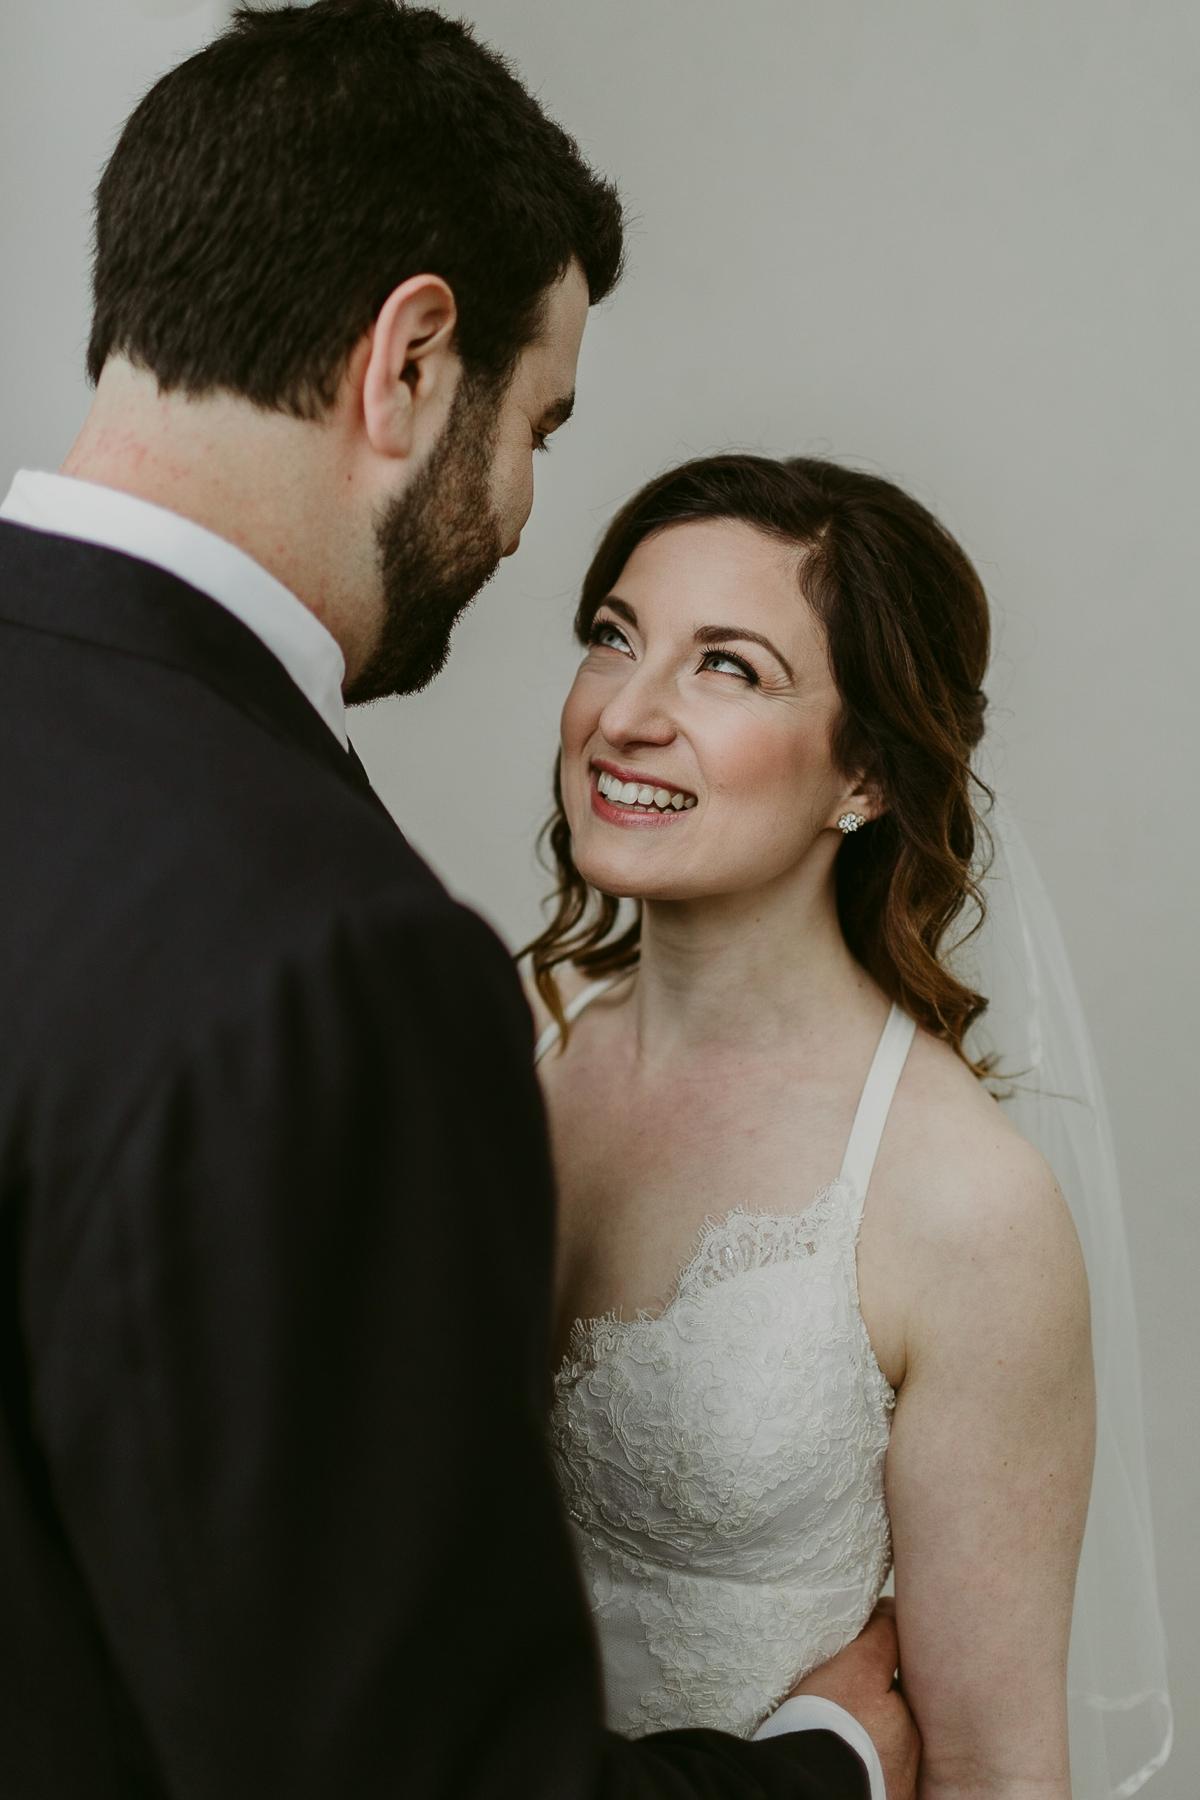 Rachel+Michael_Lake-Erie-Building-Cleveland-Wedding_M+J-Photographers-271.jpg